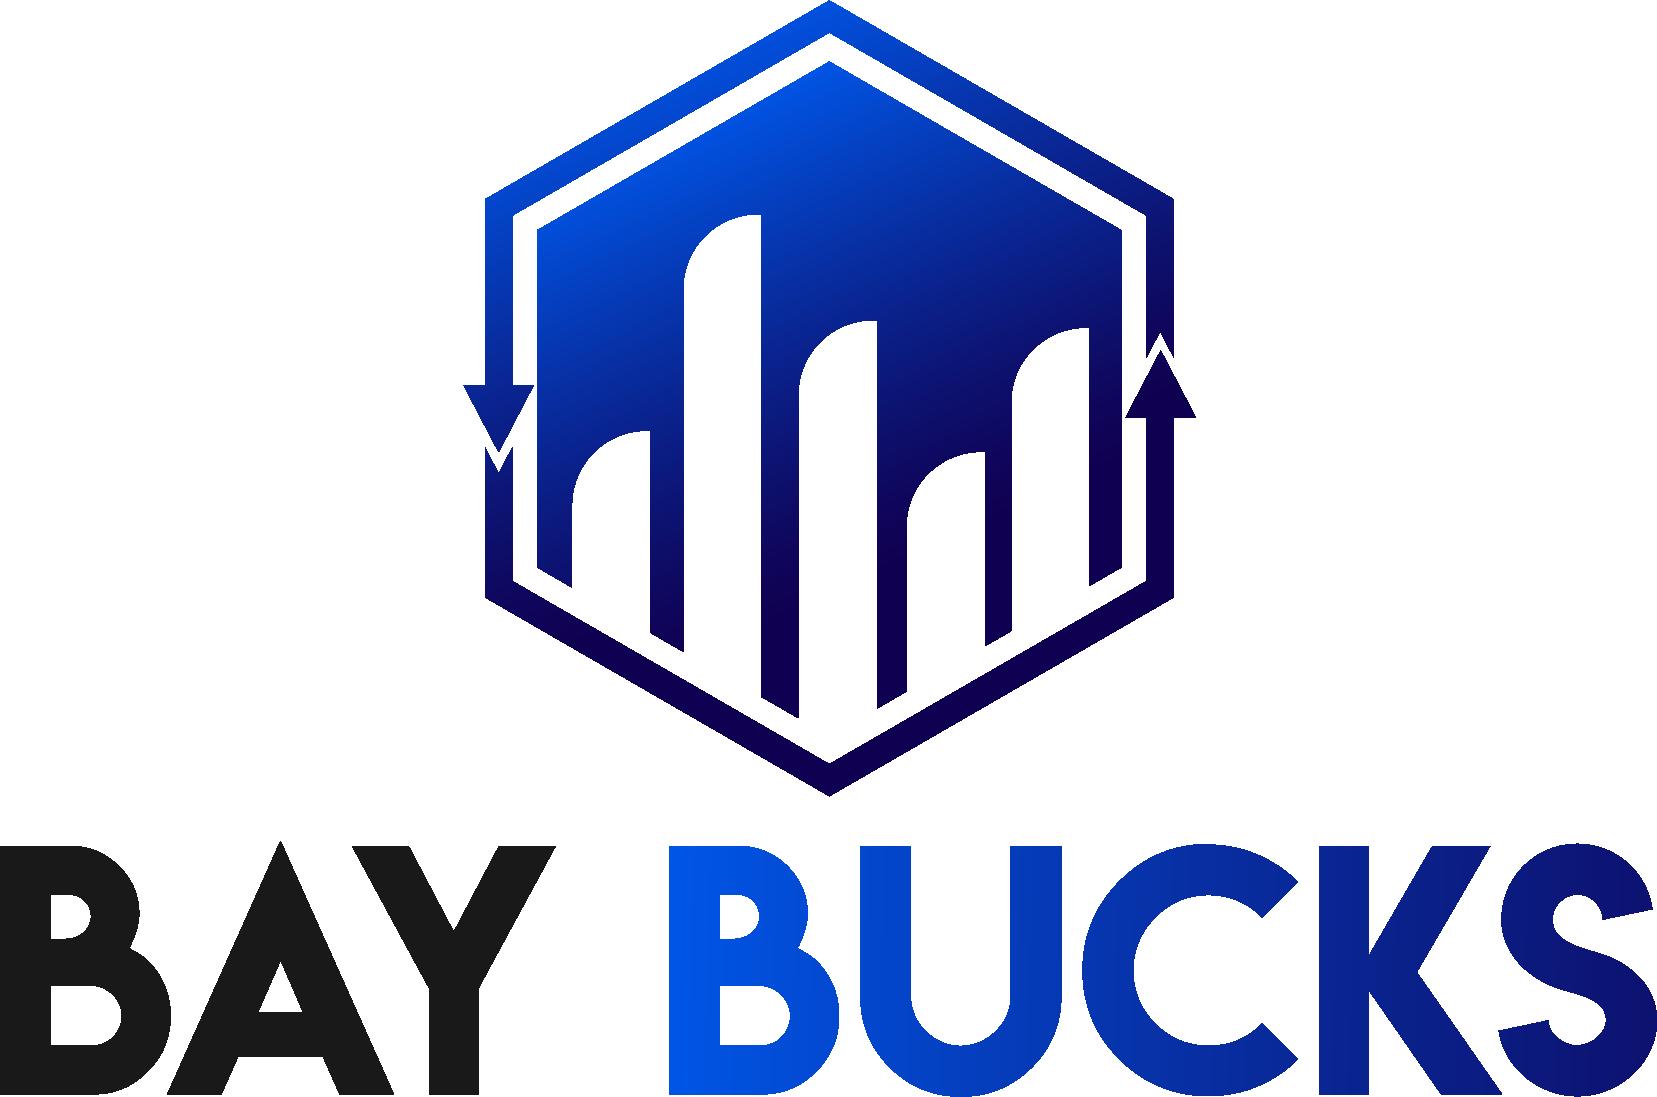 baybucks.com